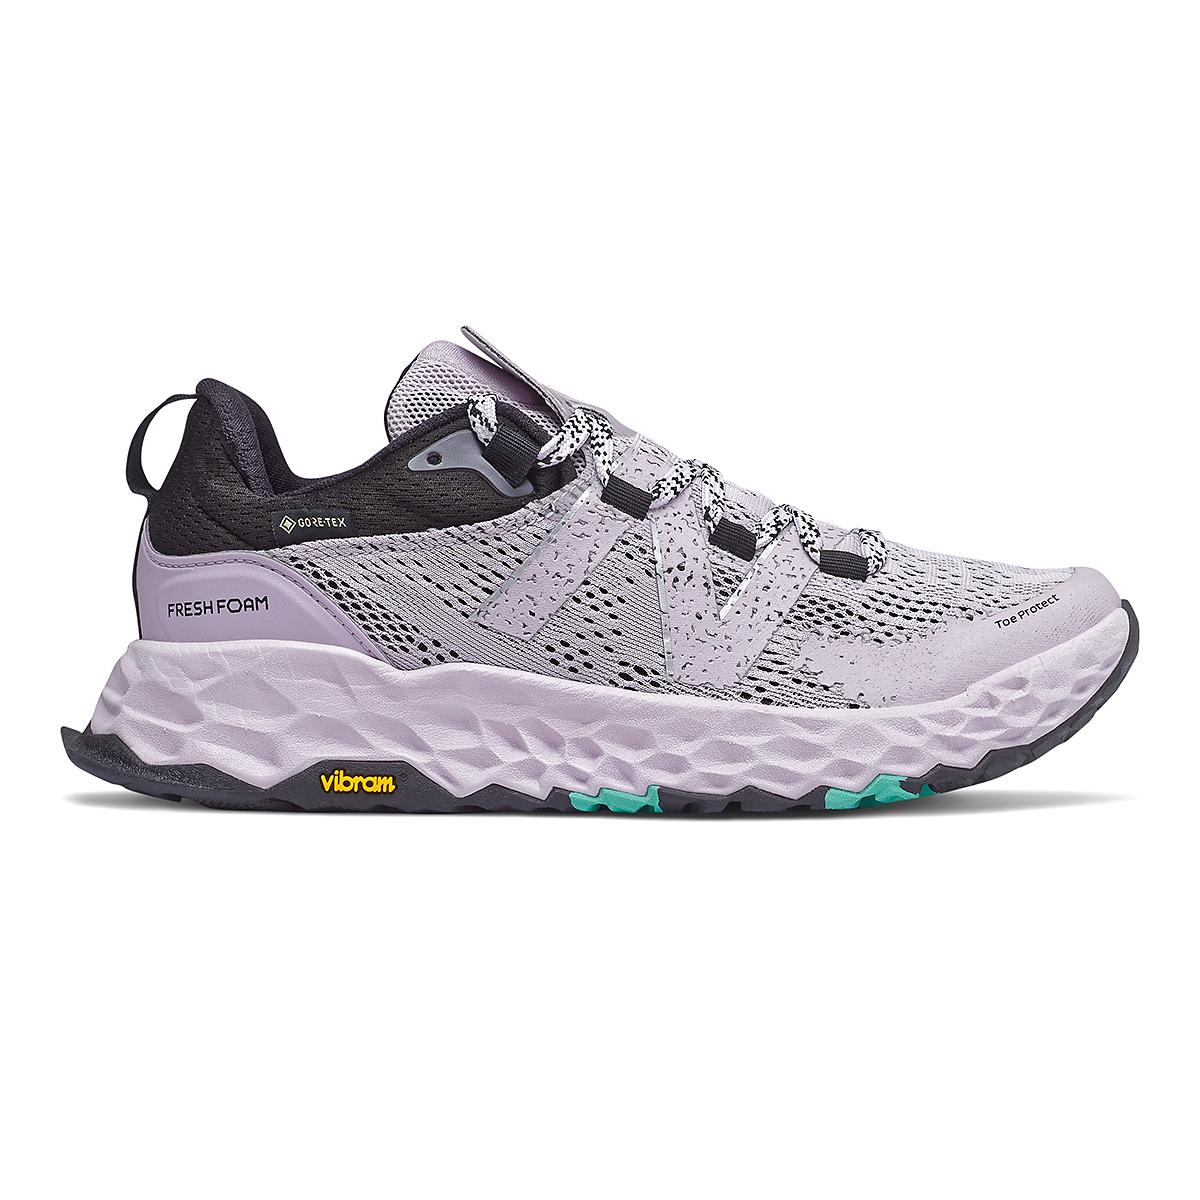 Women's New Balance Hierro V5 Gore-Tex Running Shoe - Color: Mystic Purple - Size: 6 - Width: Regular, Mystic Purple, large, image 1